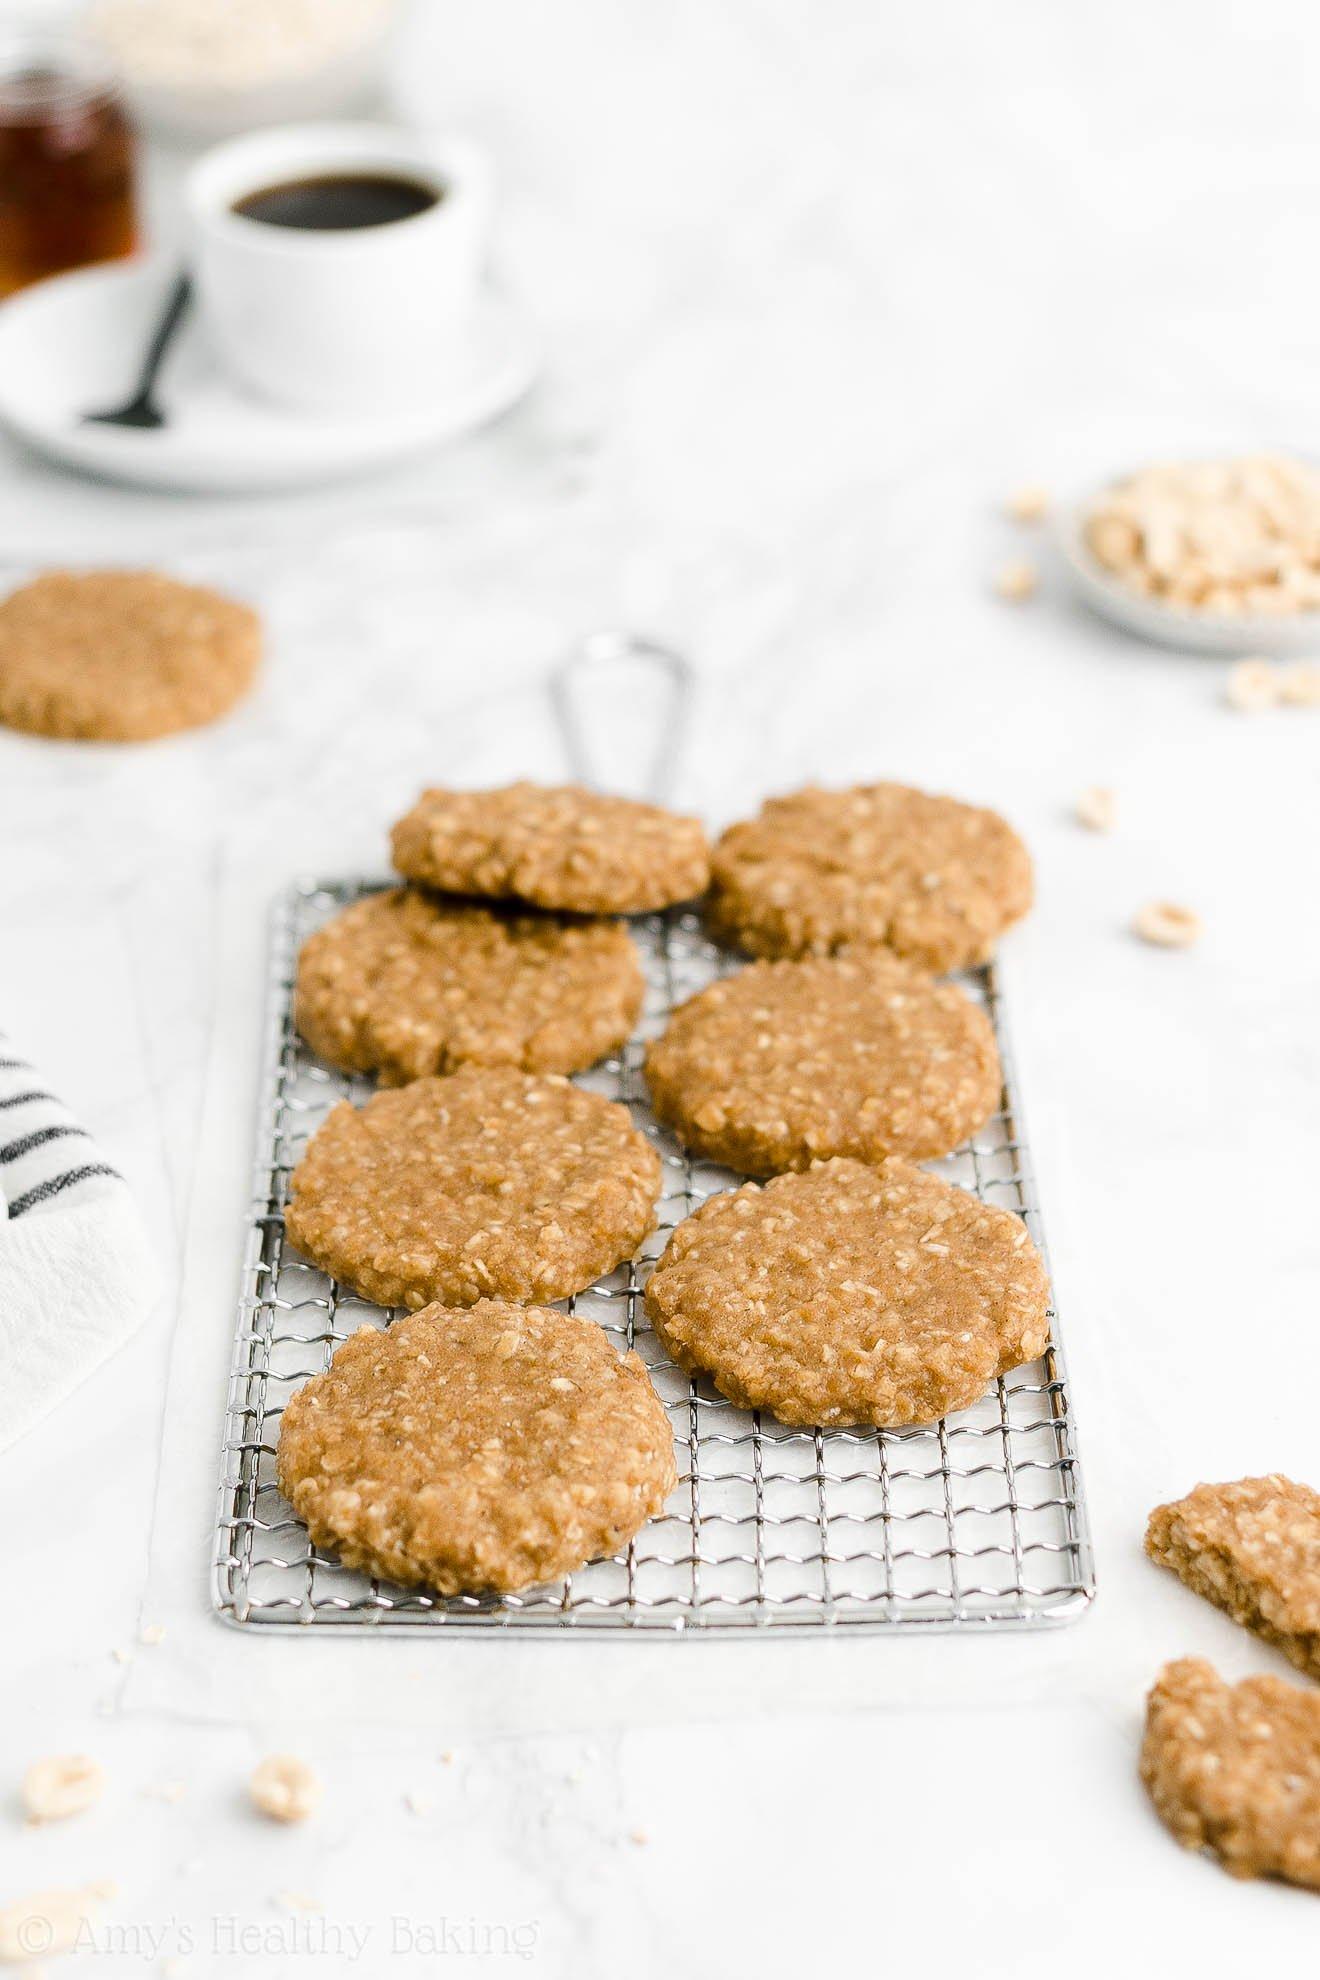 Easy Healthy Weight Watchers Flourless Peanut Butter Oatmeal Breakfast Cookies